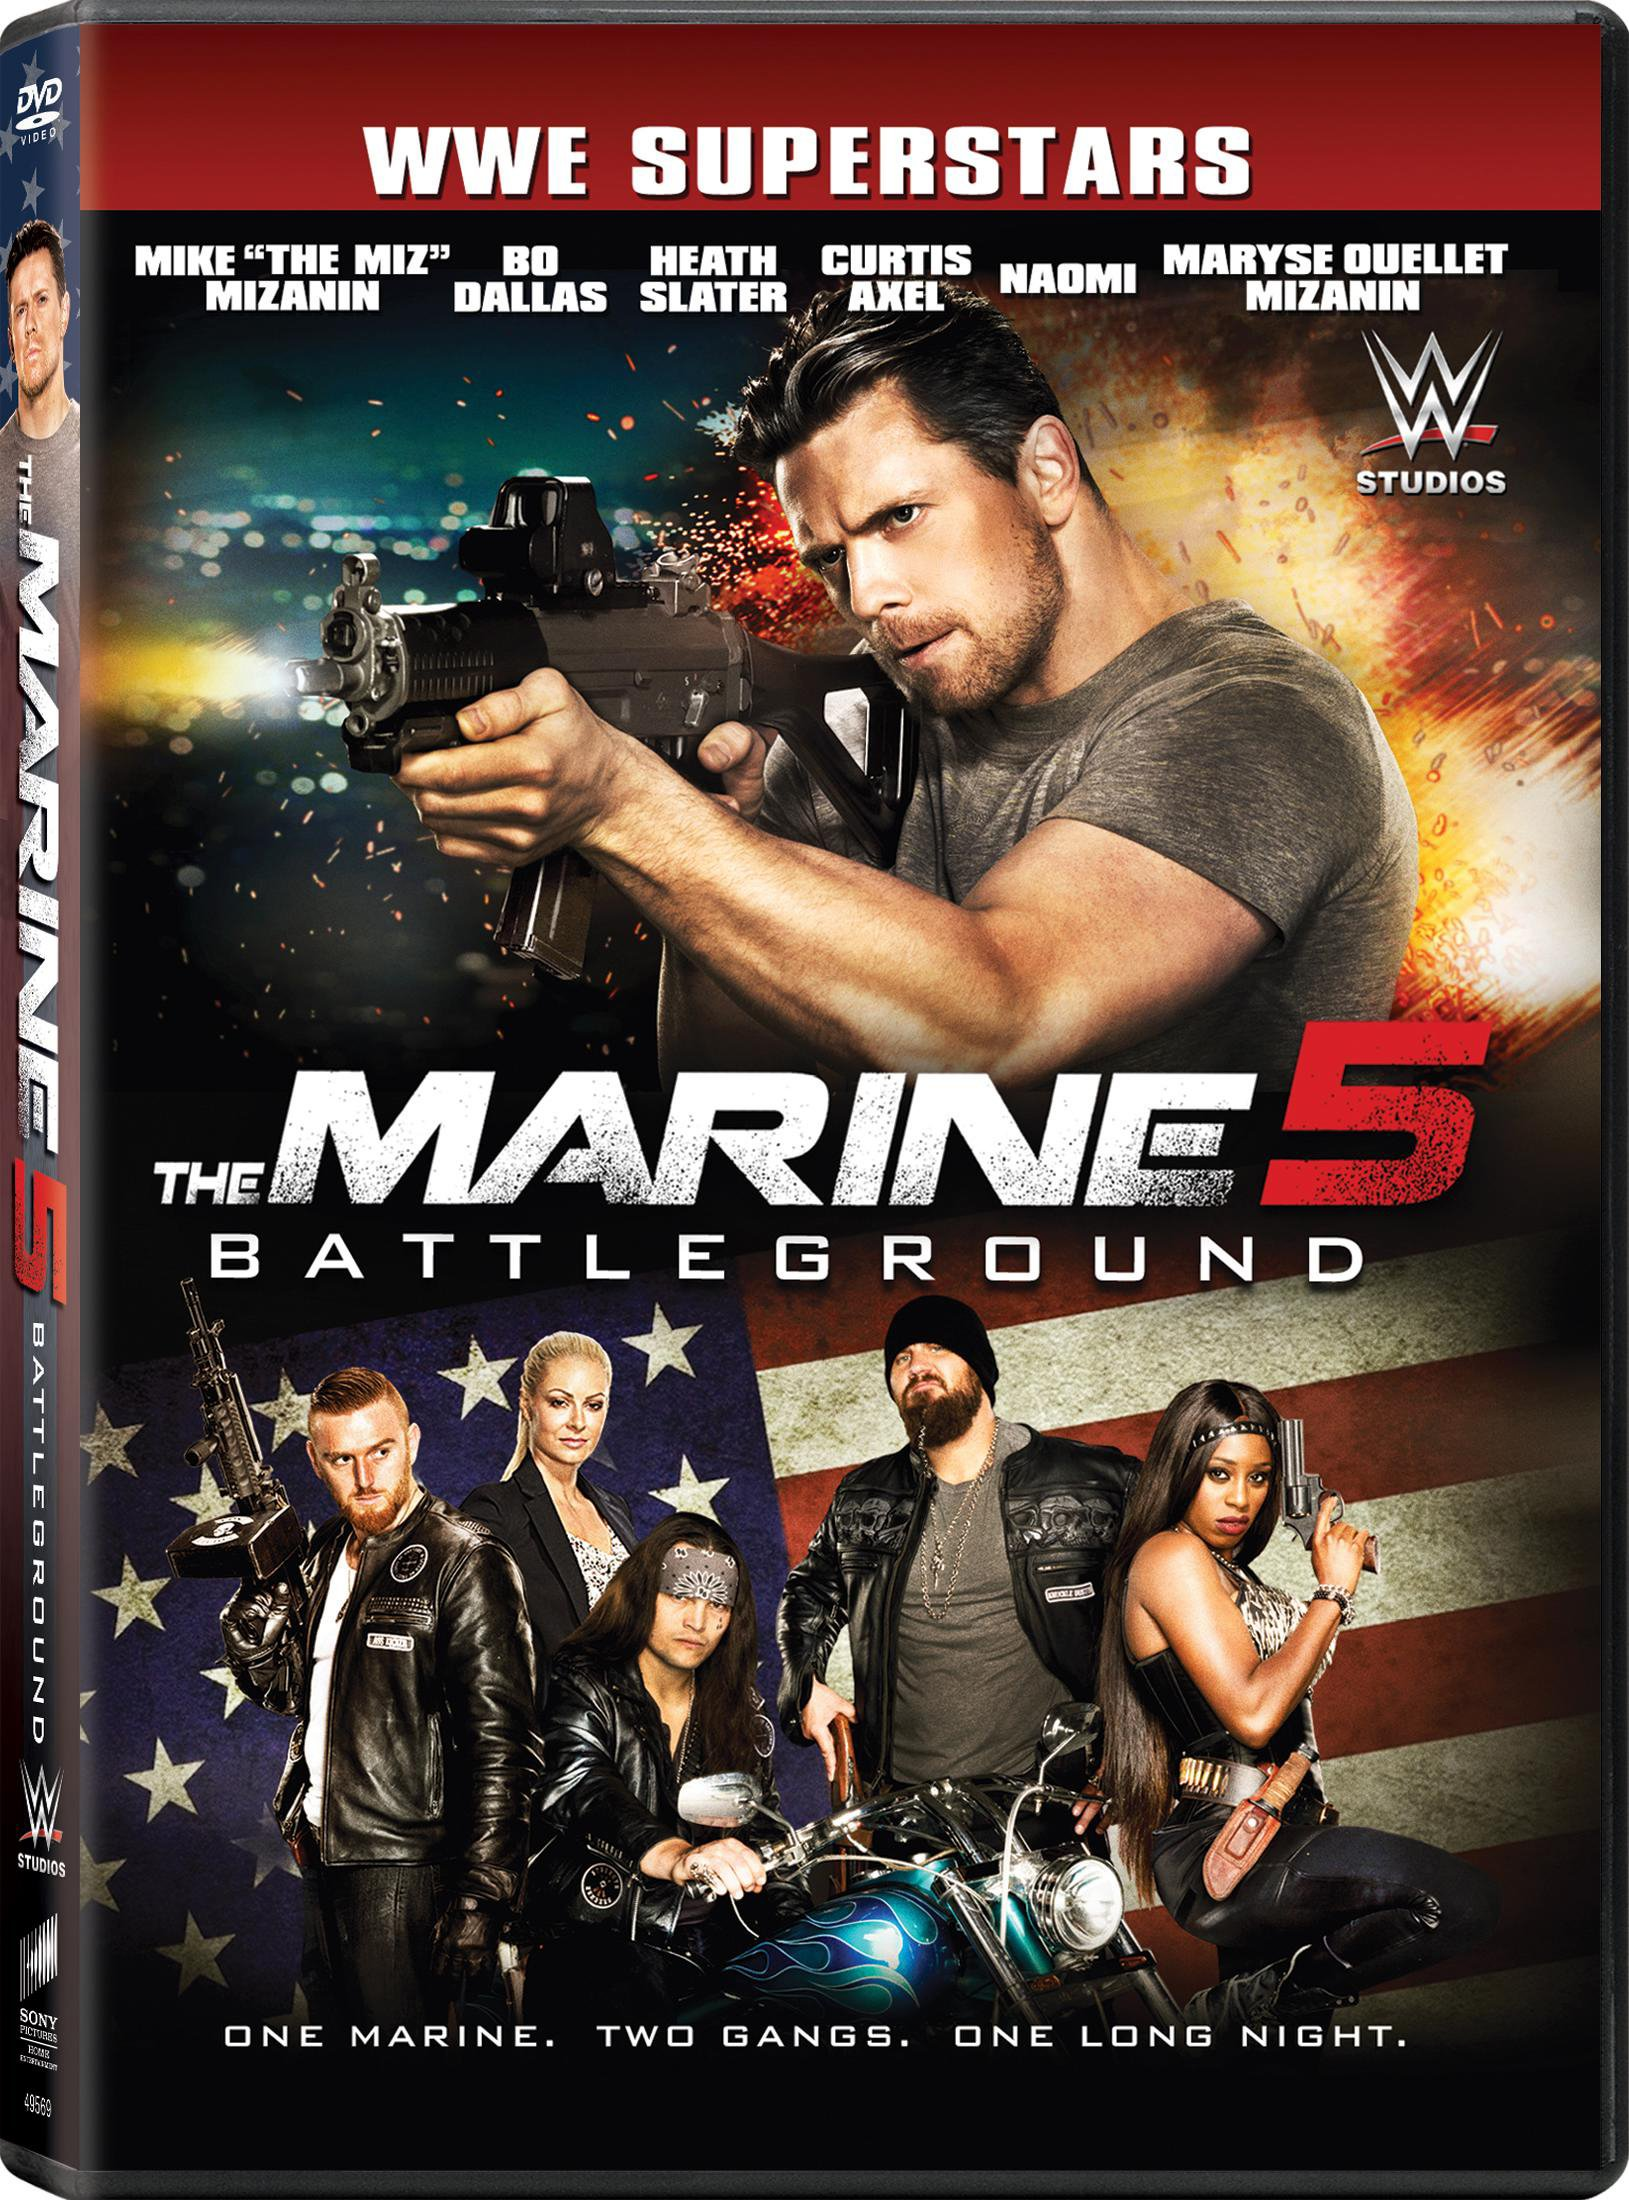 The Marine 5 Battleground DVD Release Date April 25 2017